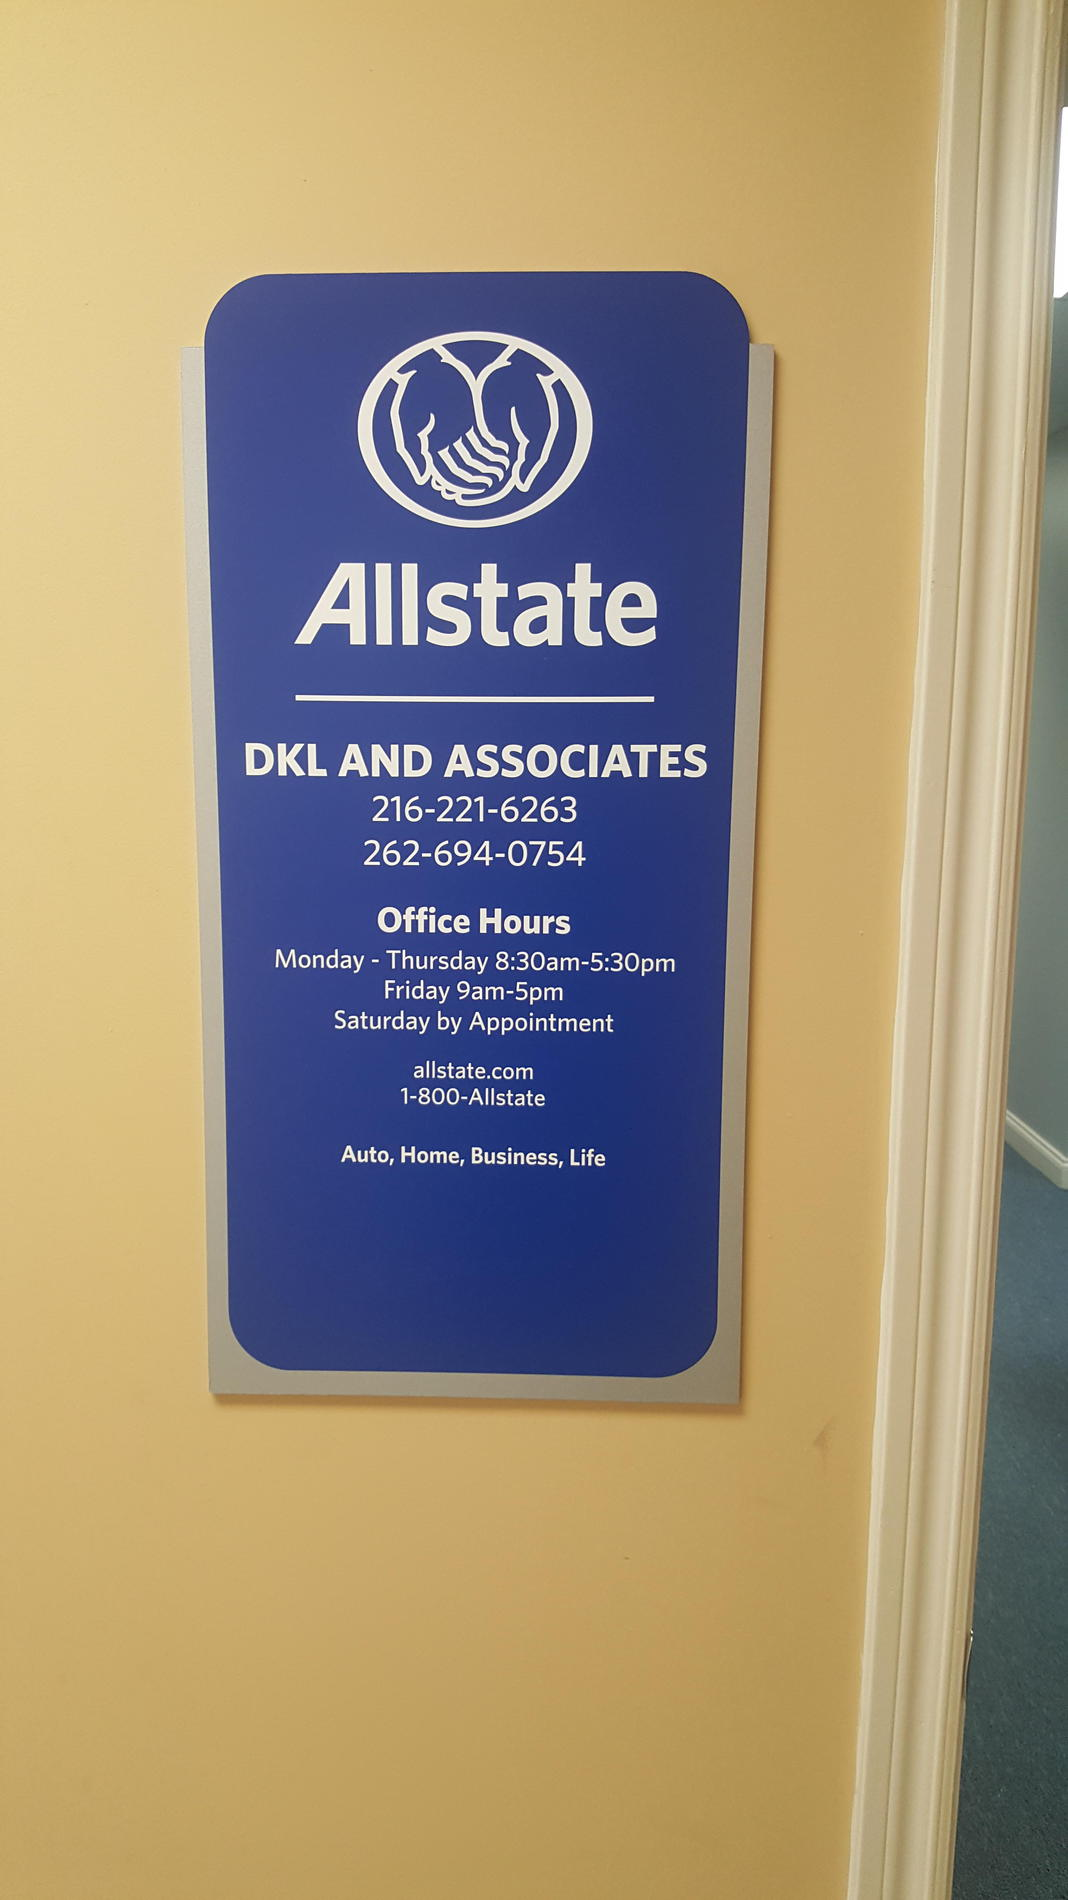 Allstate | Car Insurance in Parma, OH - Daniel Davis